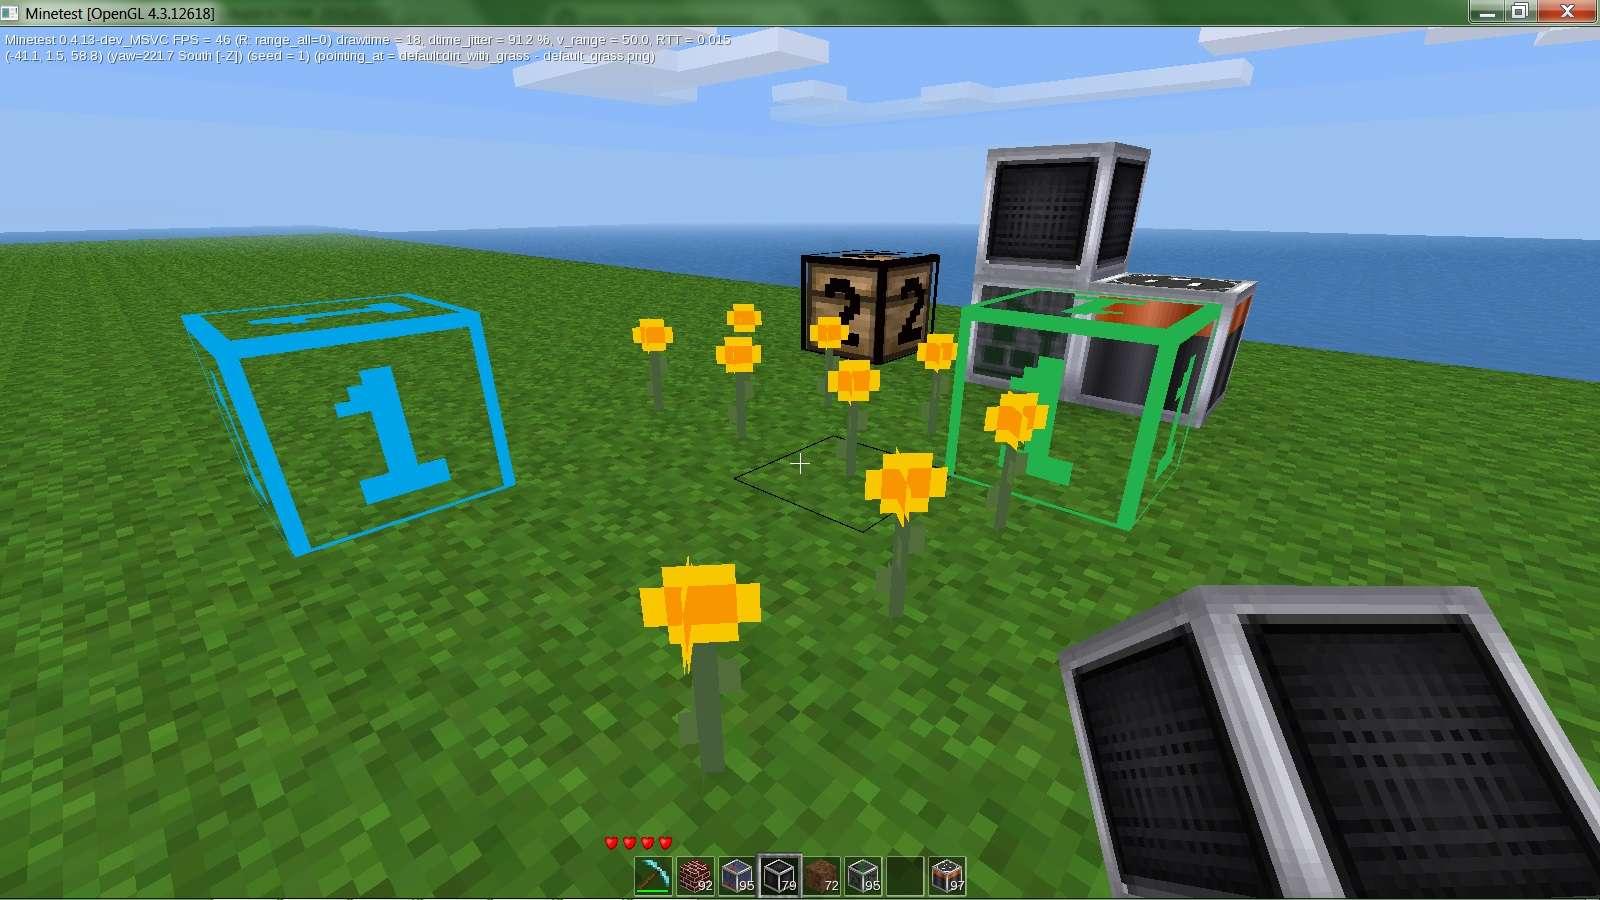 keypad2